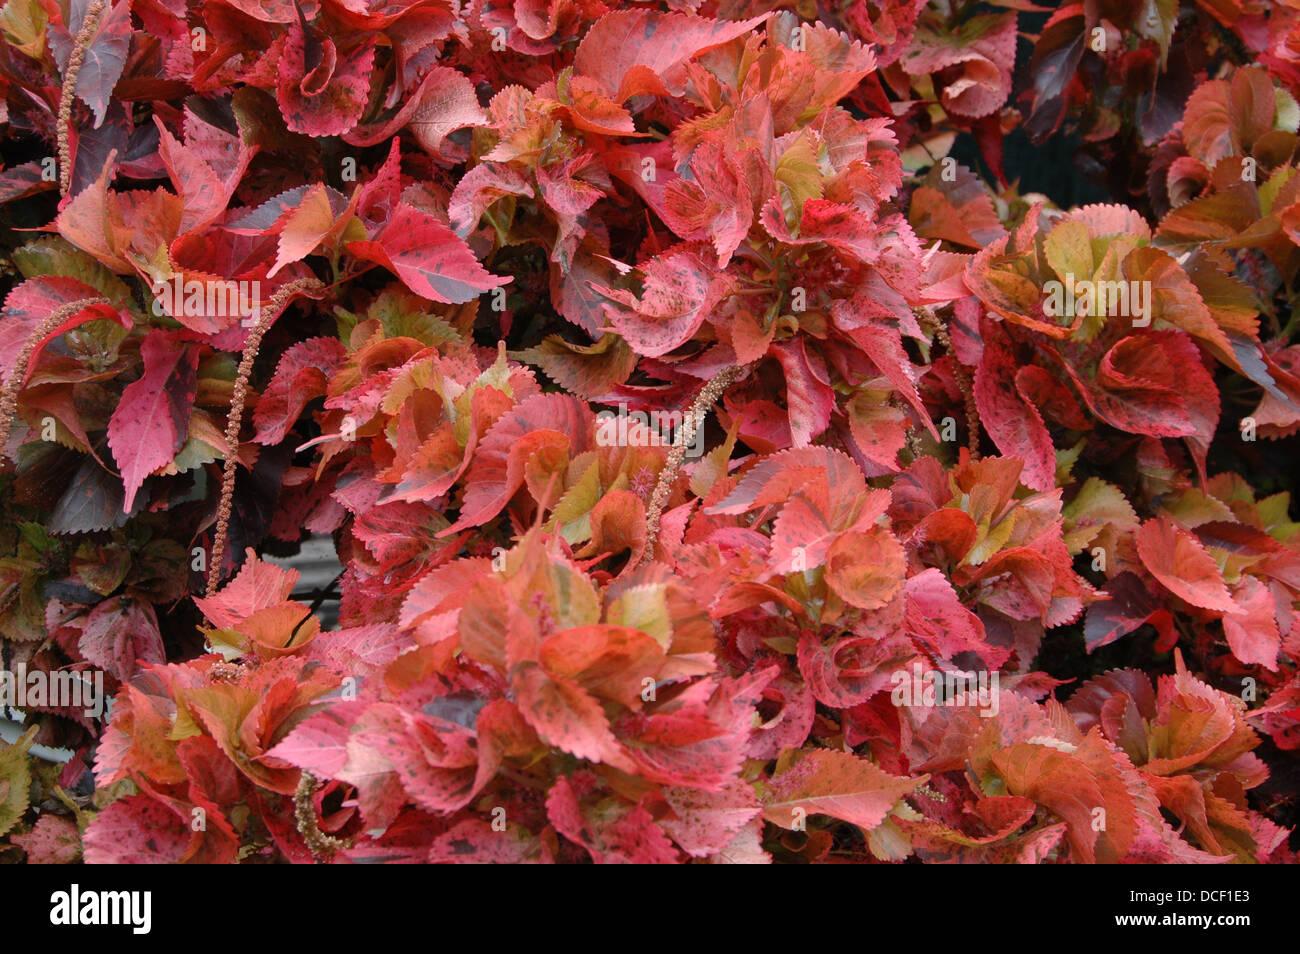 Copperleafs Acalypha Wilkesiana Copper Leaf Foliage Stock Photo